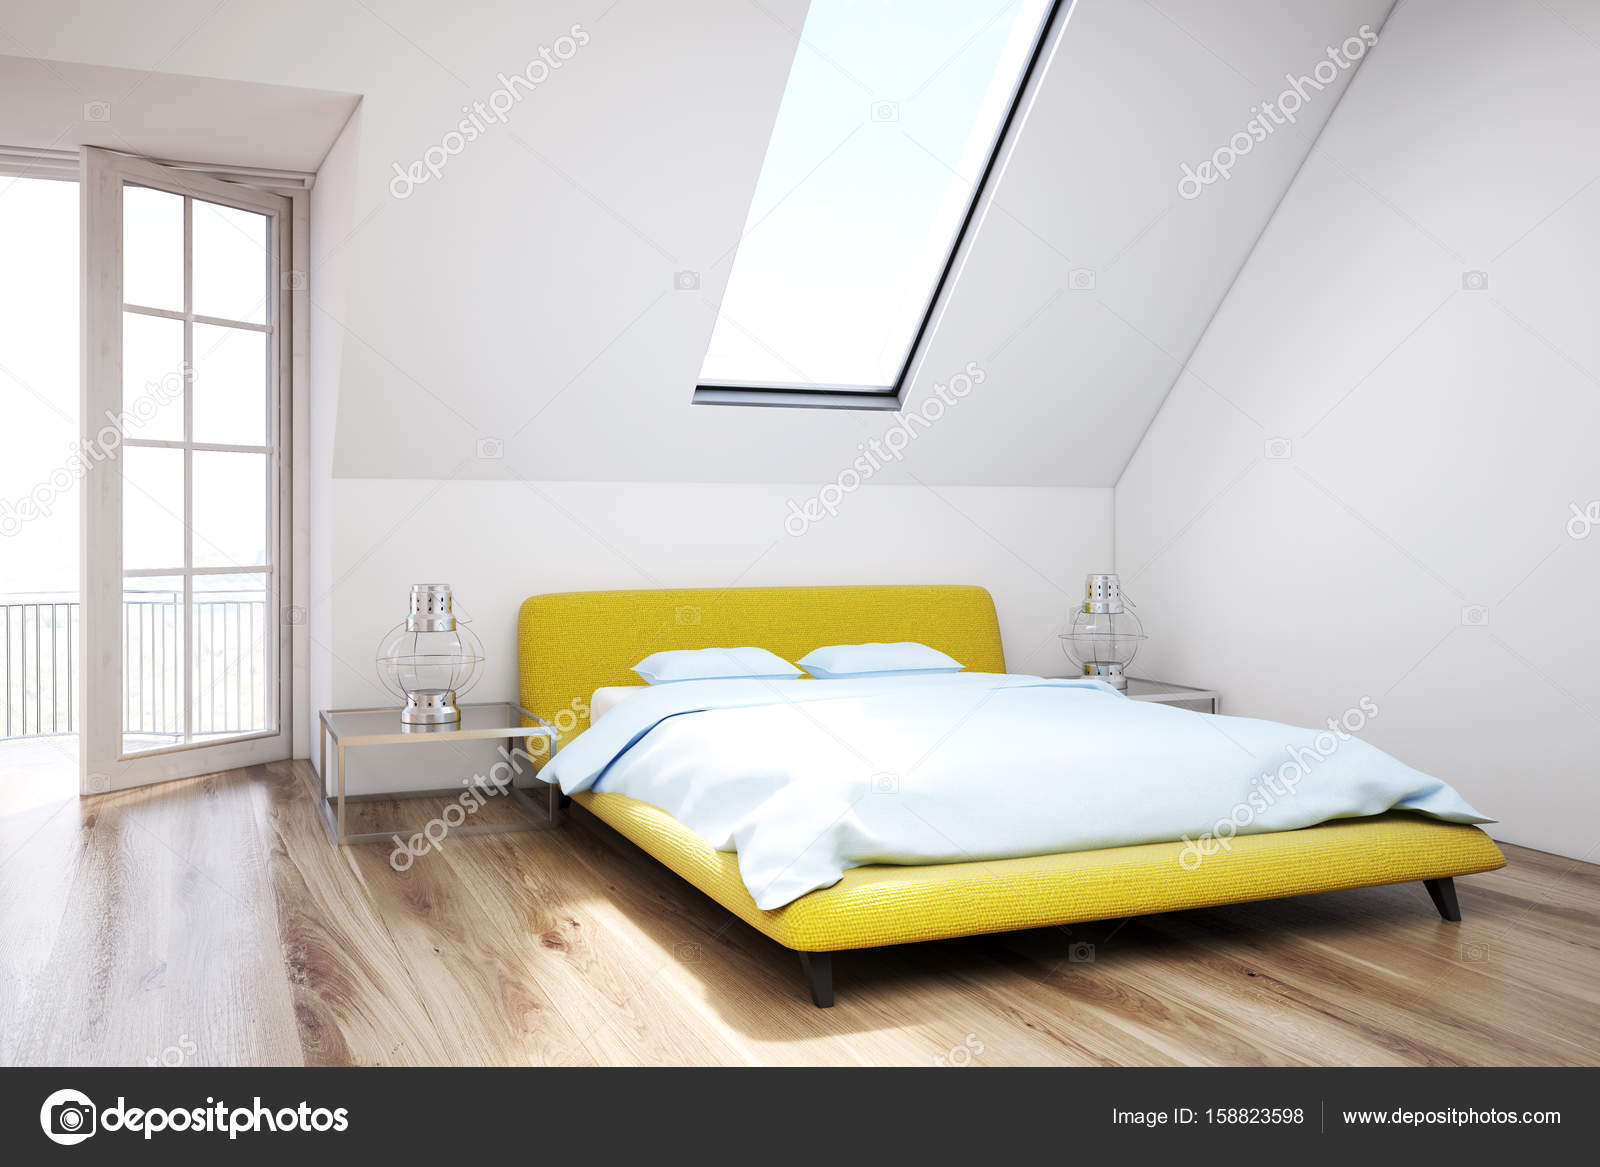 Slaapkamer Houten Vloer : Witte zolder slaapkamer houten vloer close up u2014 stockfoto